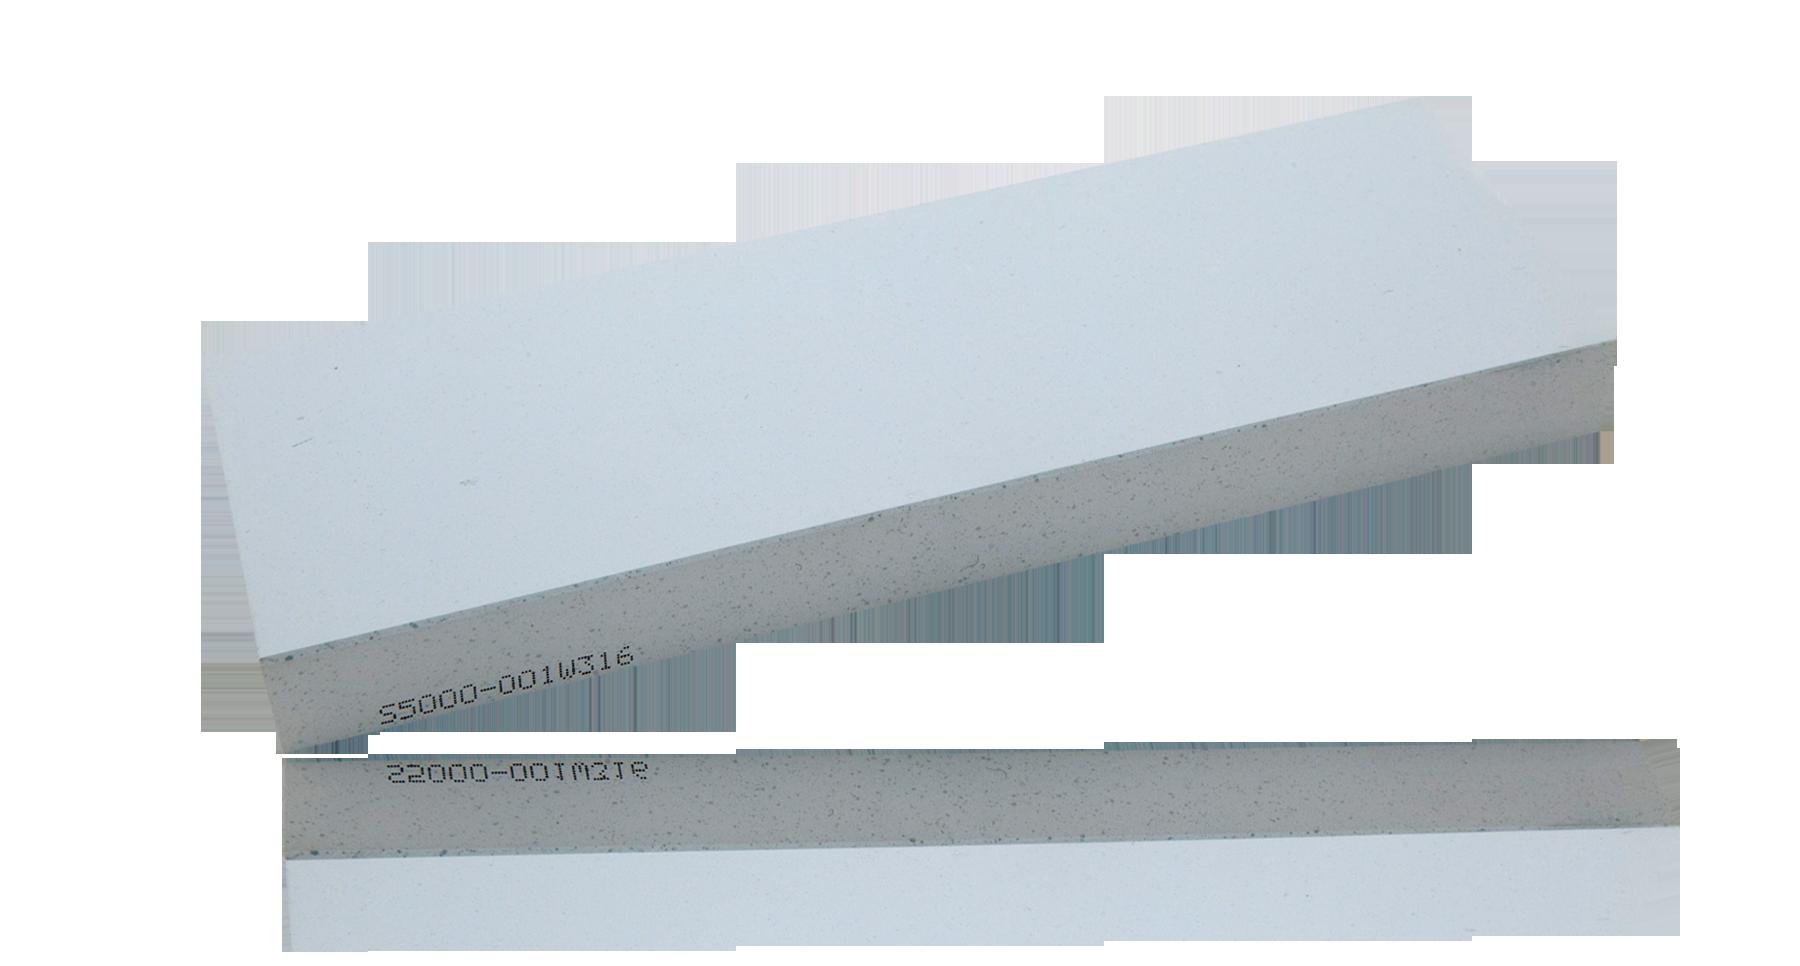 Камень точильный Naniwa S-450